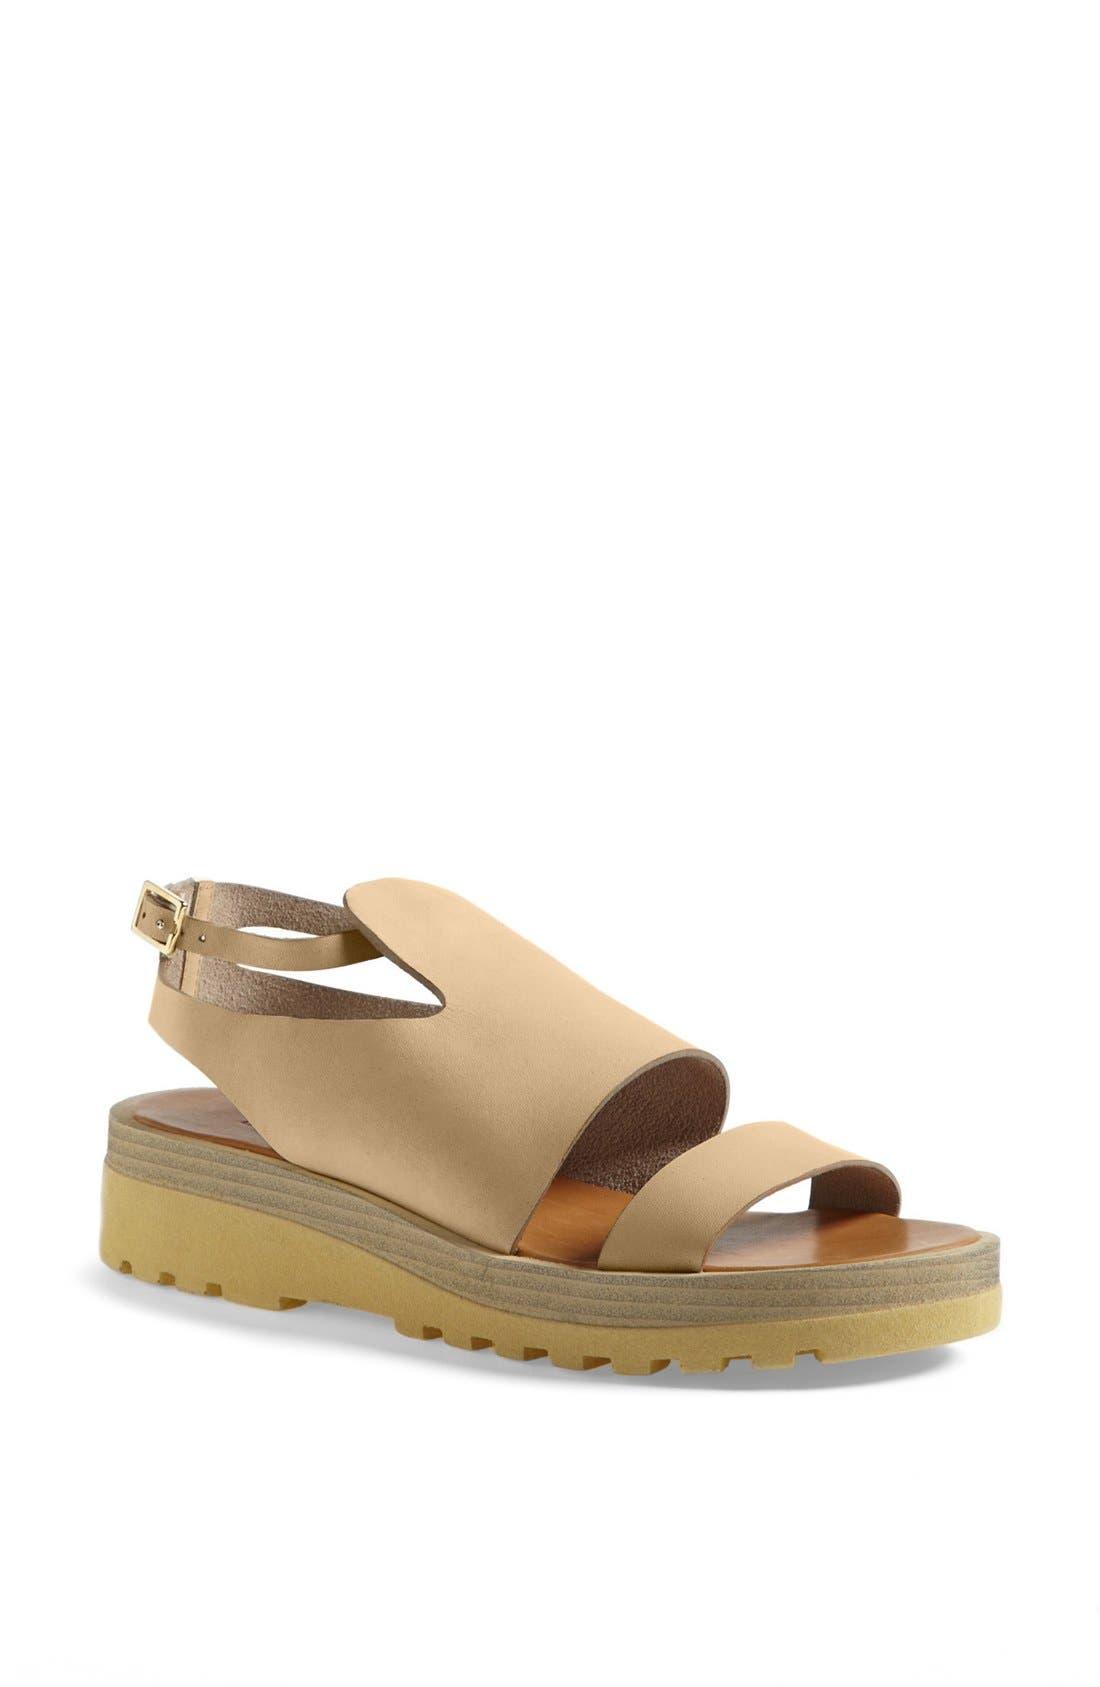 Alternate Image 1 Selected - See by Chloé Platform Sandal